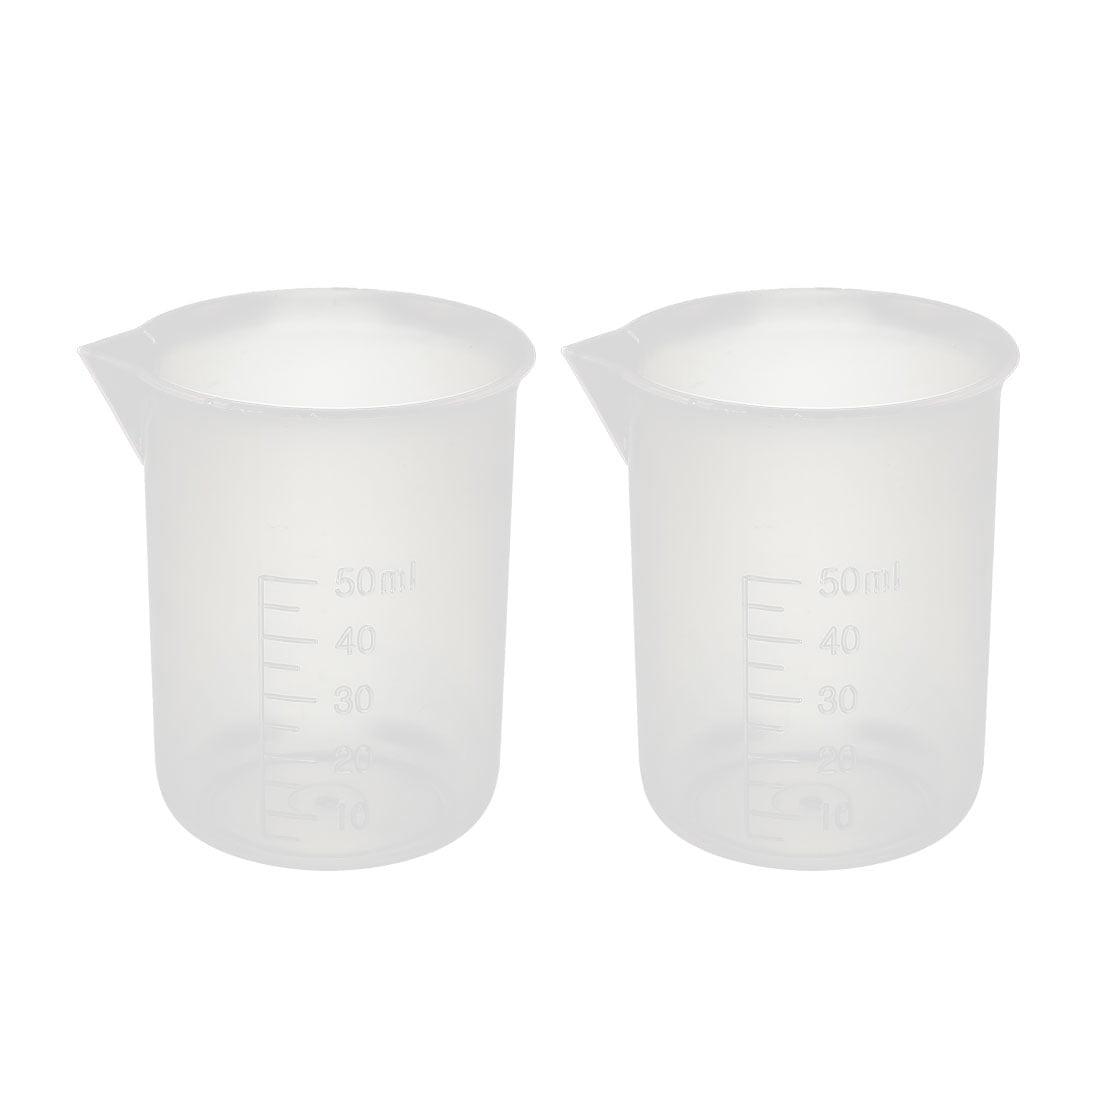 2 Pcs 50mL Laboratory Transparent Plastic Liquid Container Measuring Cup Beaker by